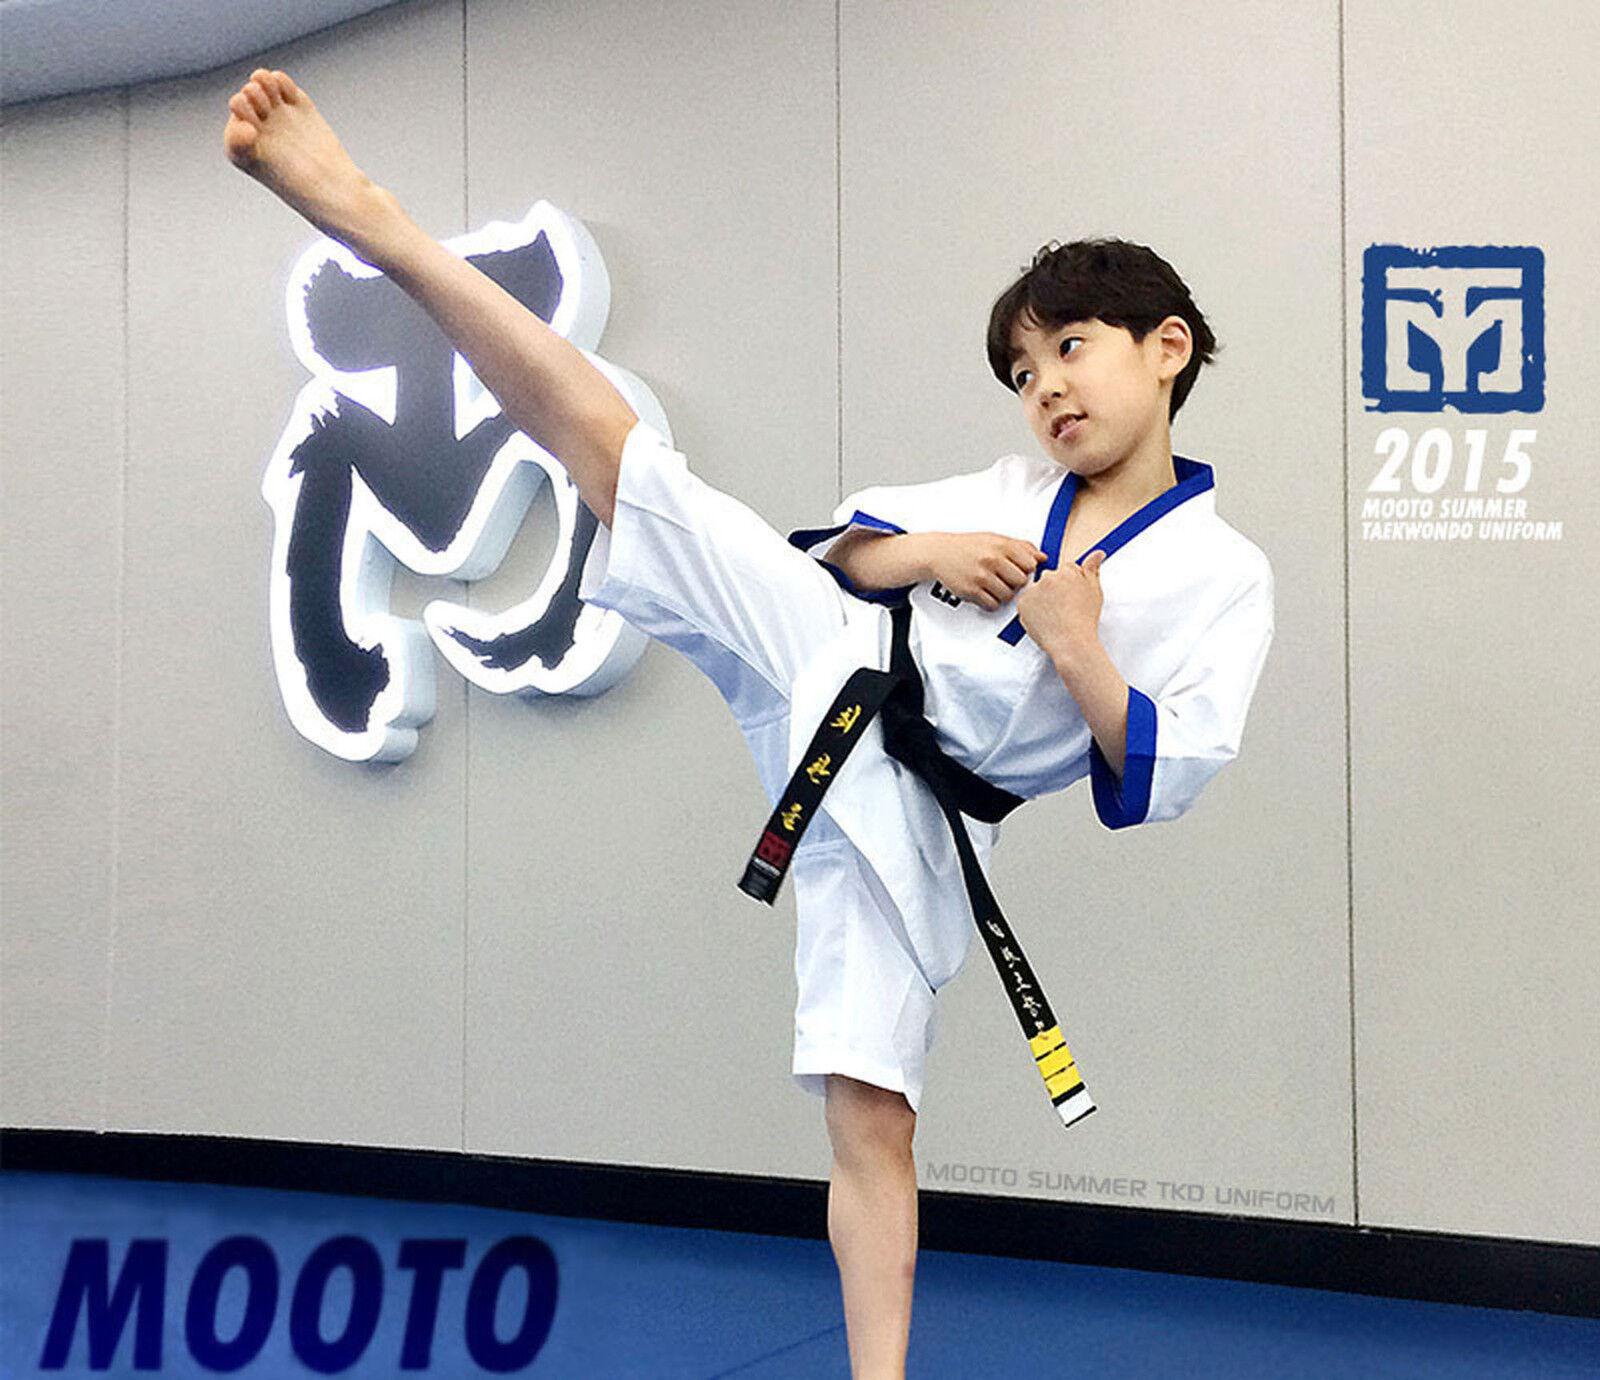 Taekwondo Summer Uniform Mooto Extera TKD Suits Doboks  Short Sleeves Cool Fabric  selling well all over the world